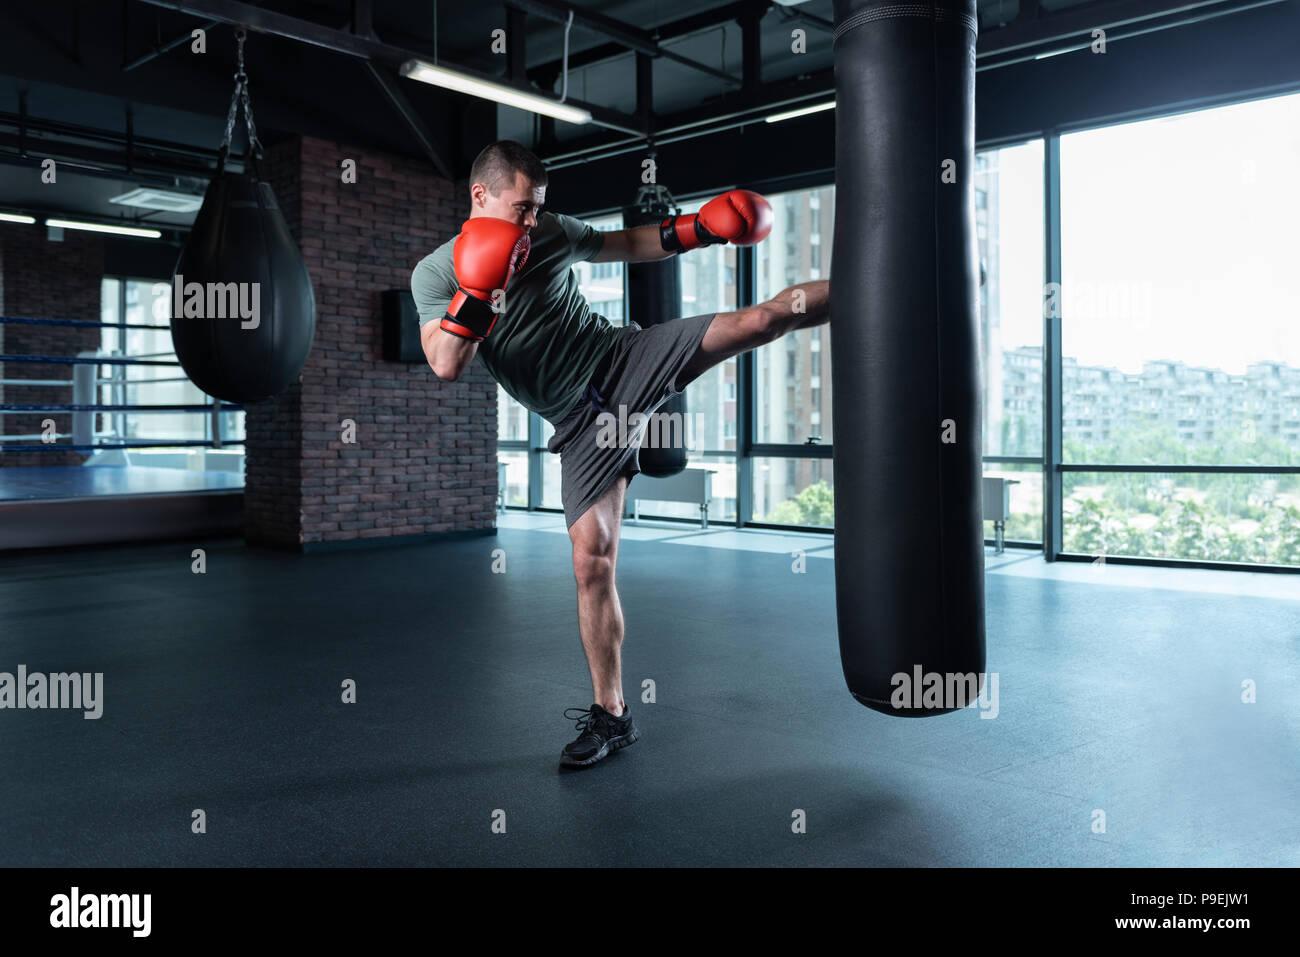 Athletic man wearing grey shorts lifting leg up - Stock Image